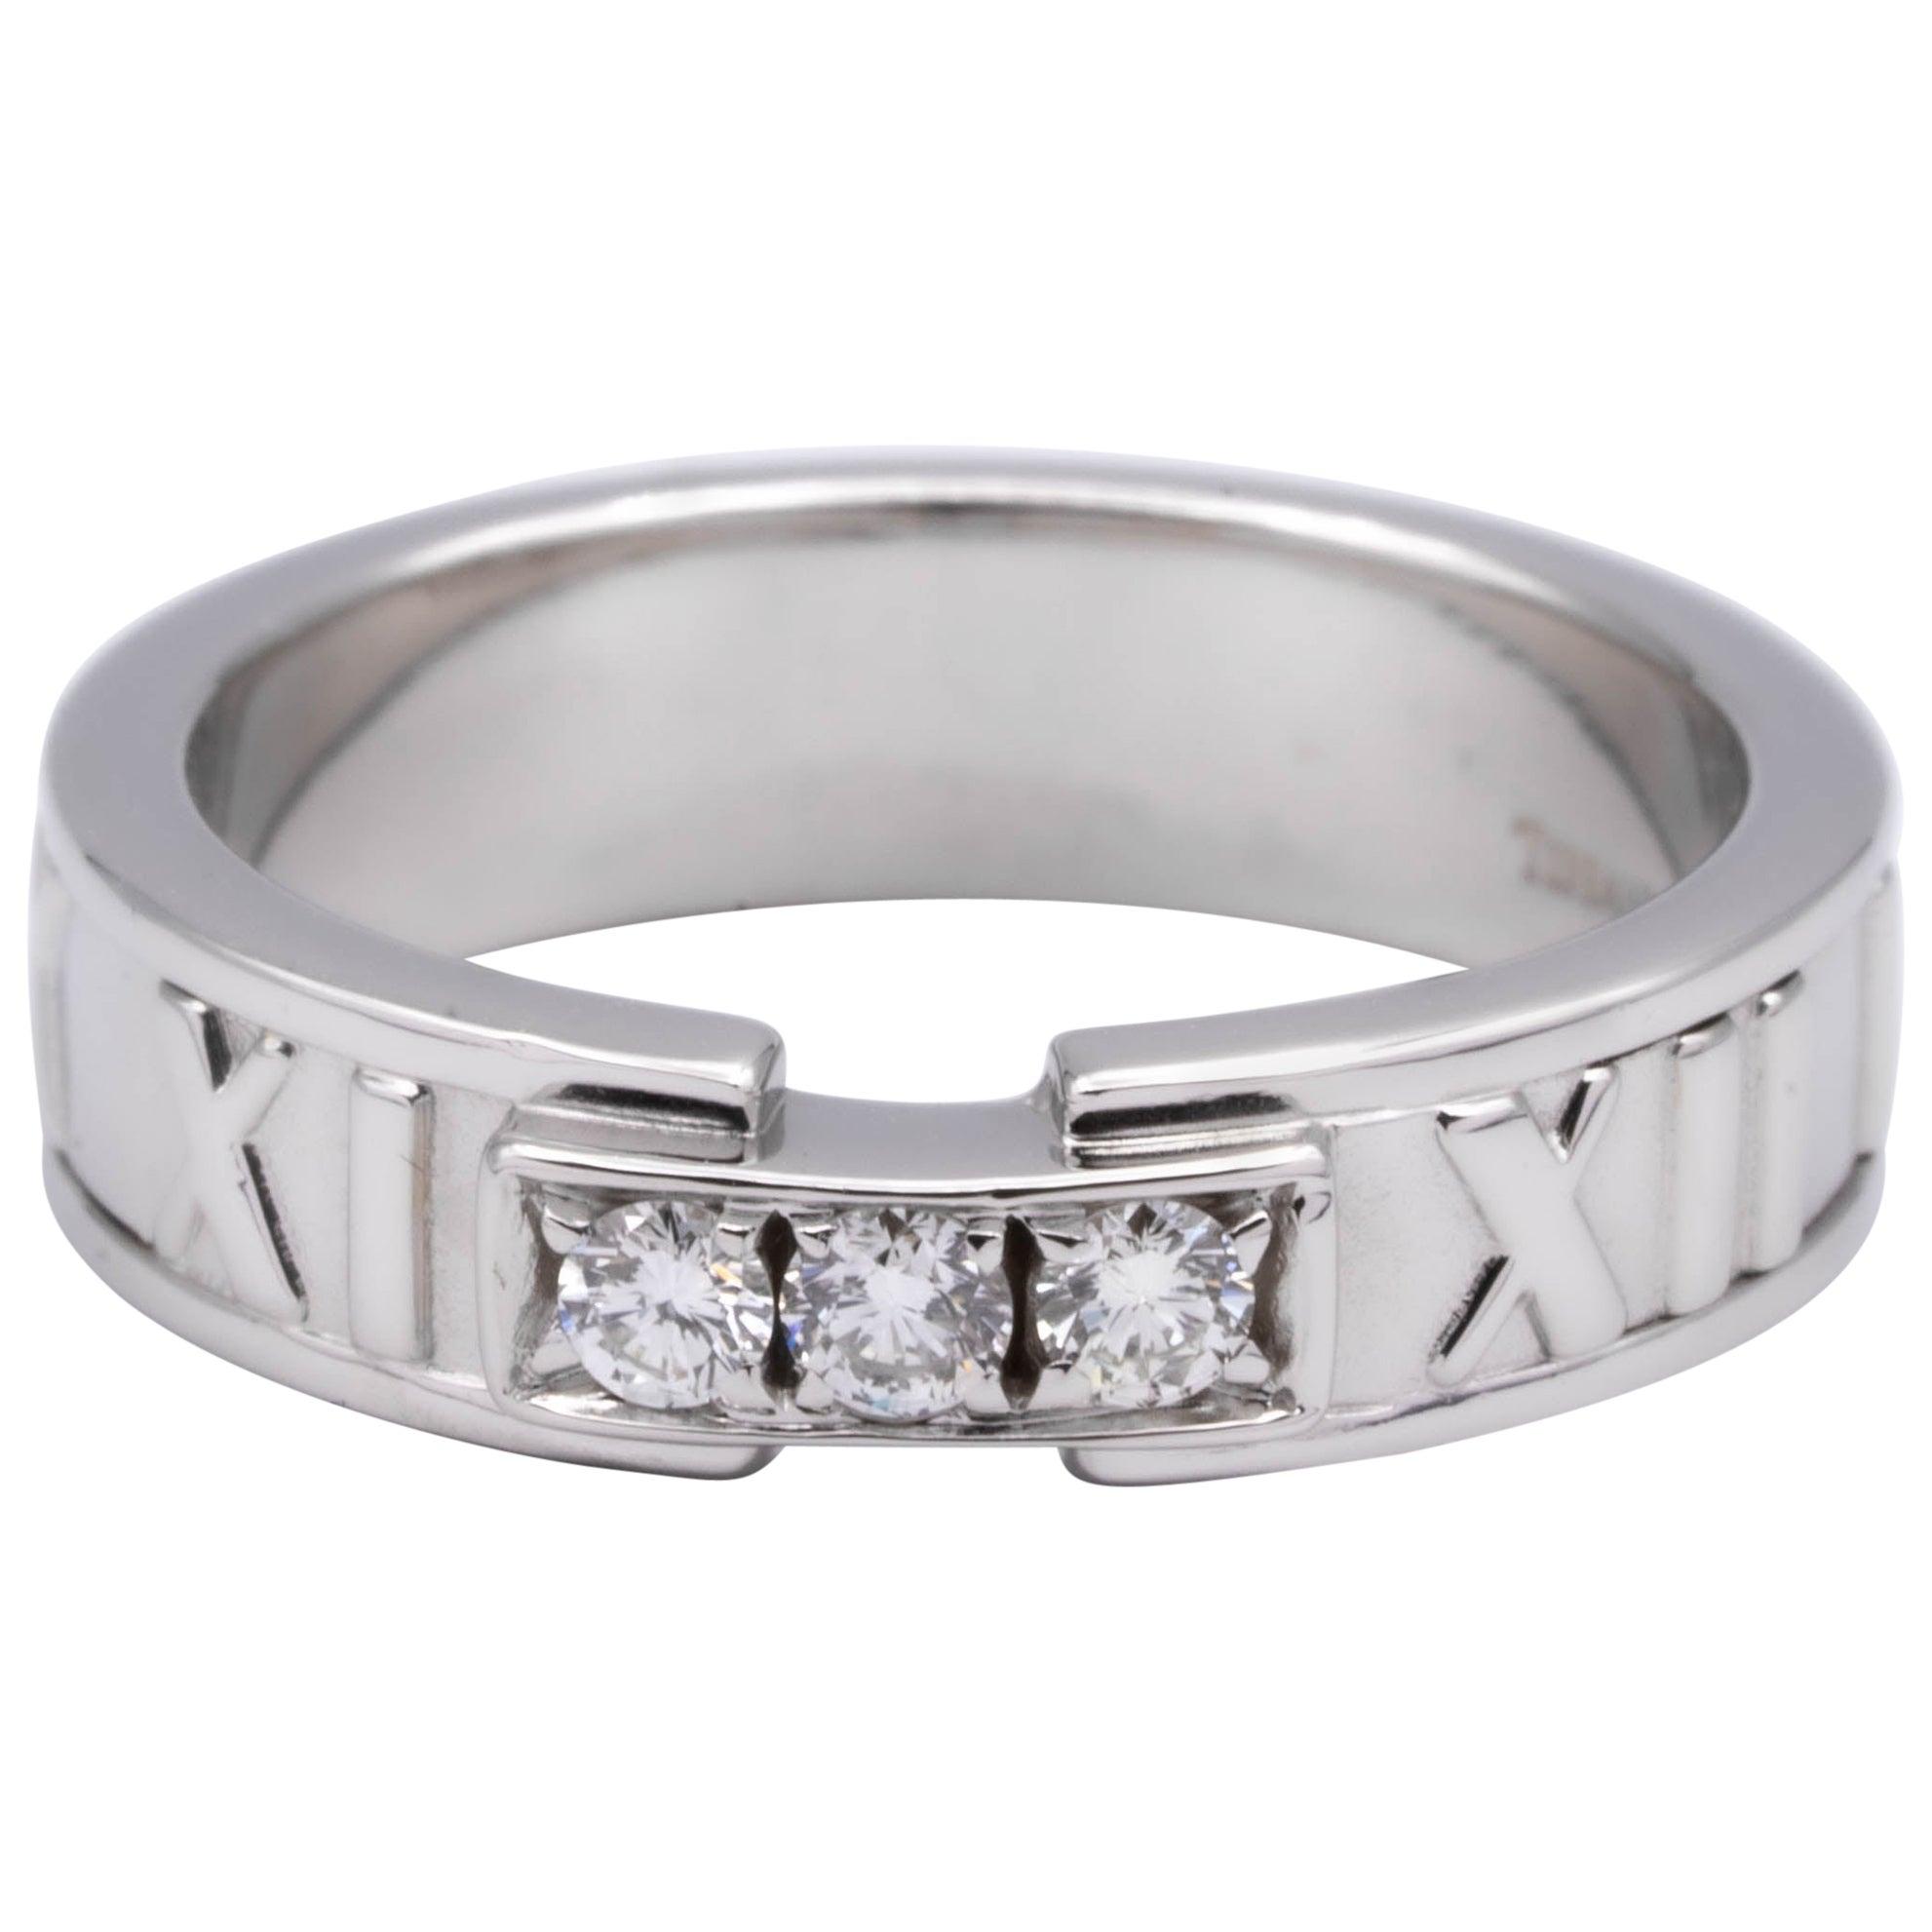 Tiffany & Co. Atlas 3-Diamond Ring in 18 Karat White Gold